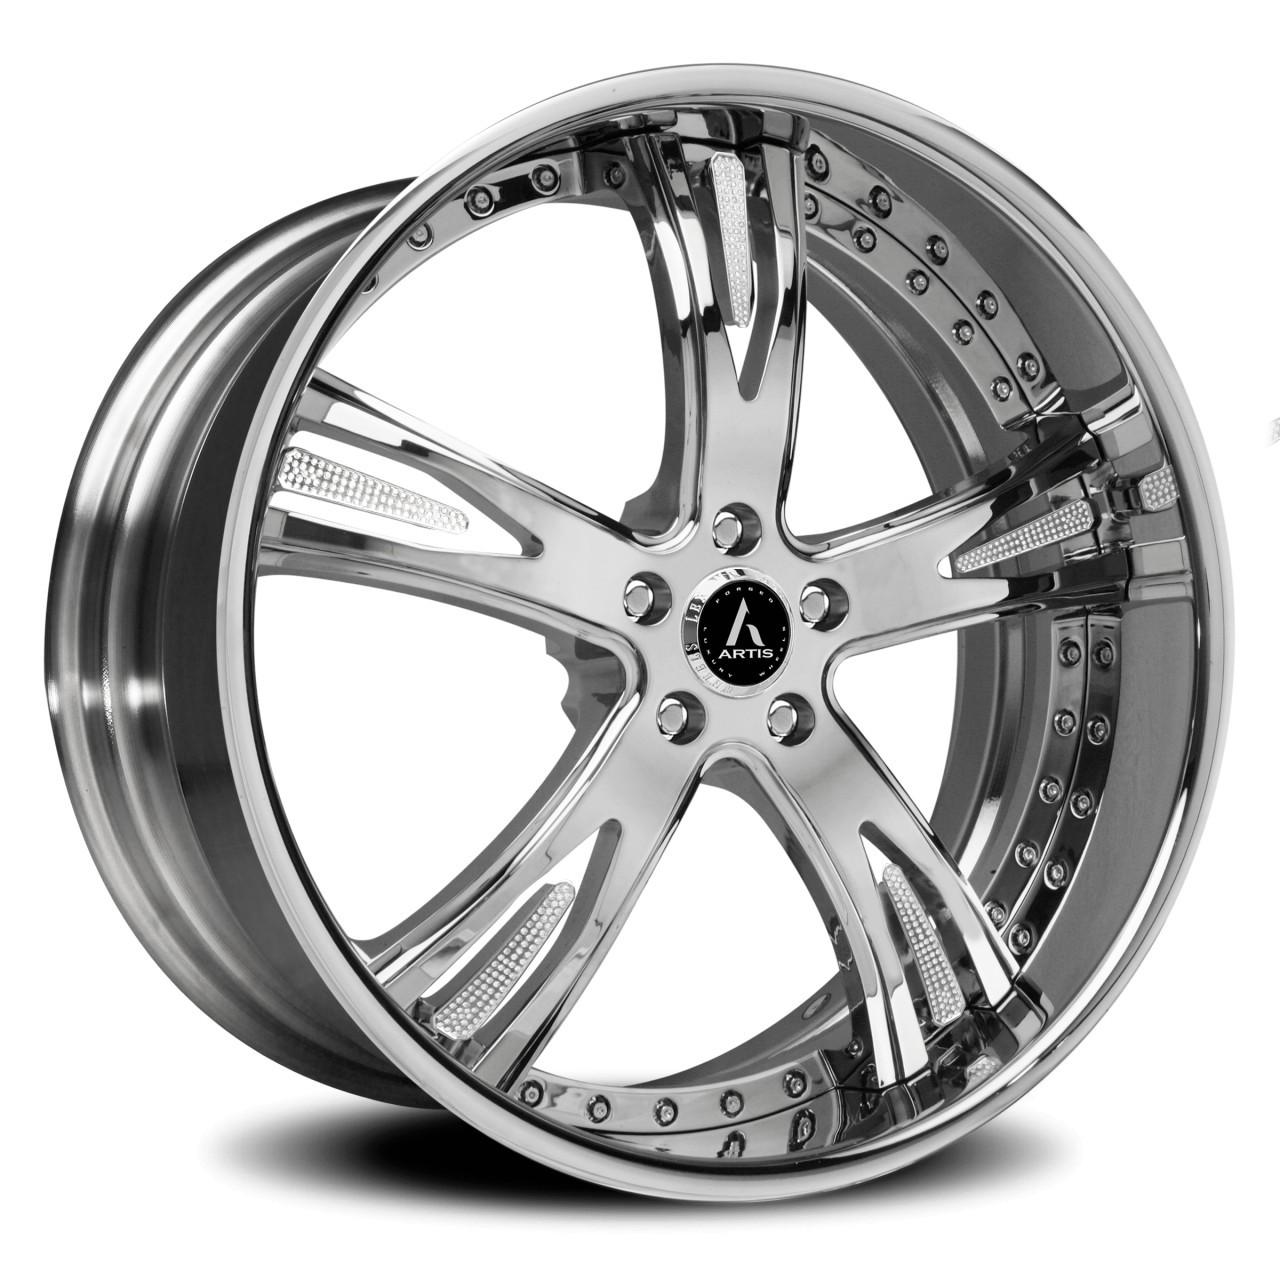 Artis Freemont forged wheels